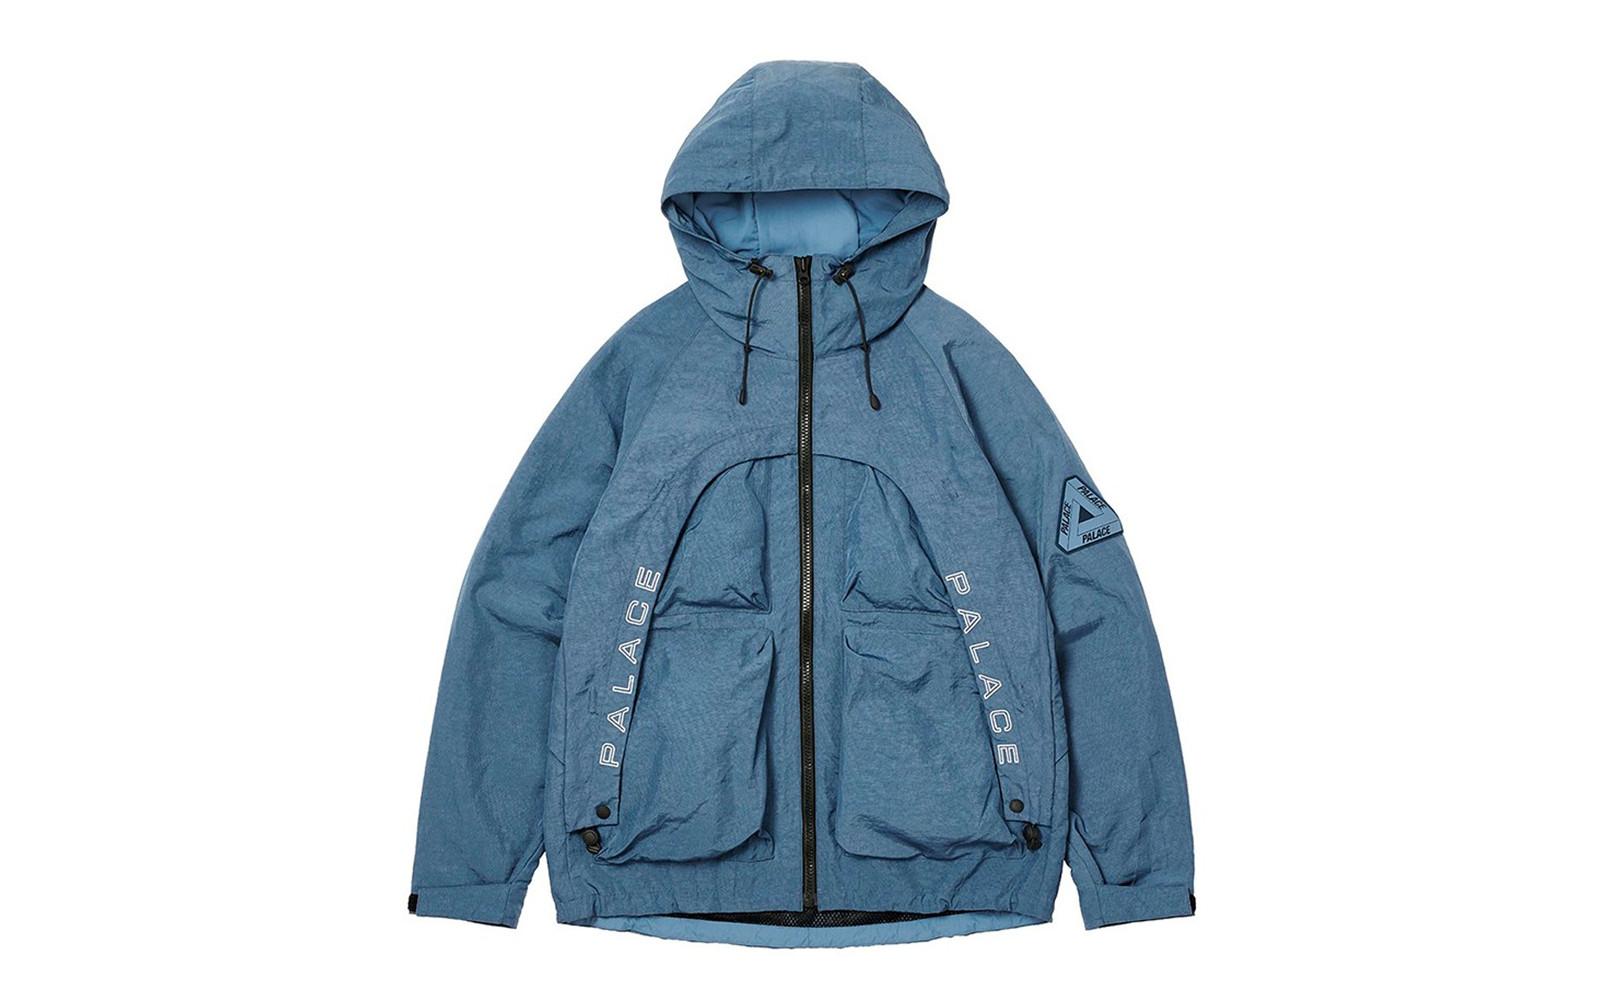 Palace Remarker Jacket